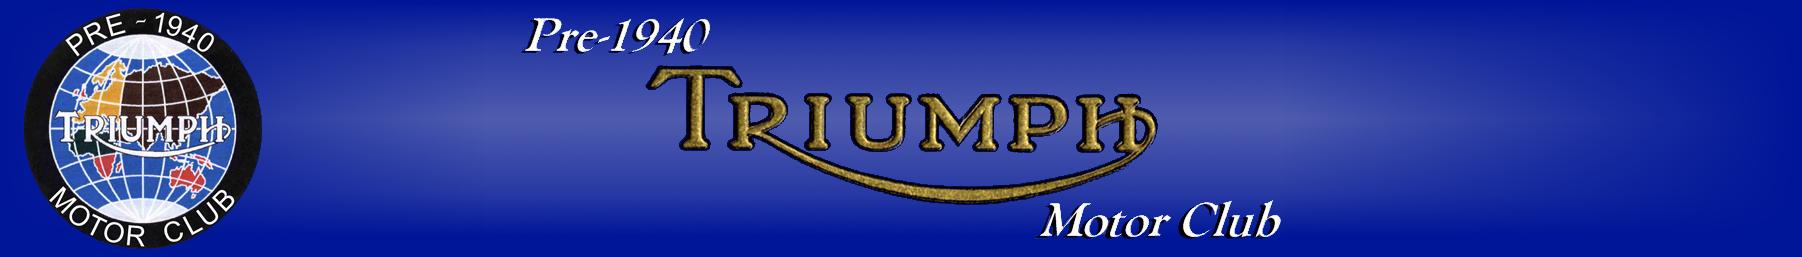 Pre-1940 Triumph Motor Club